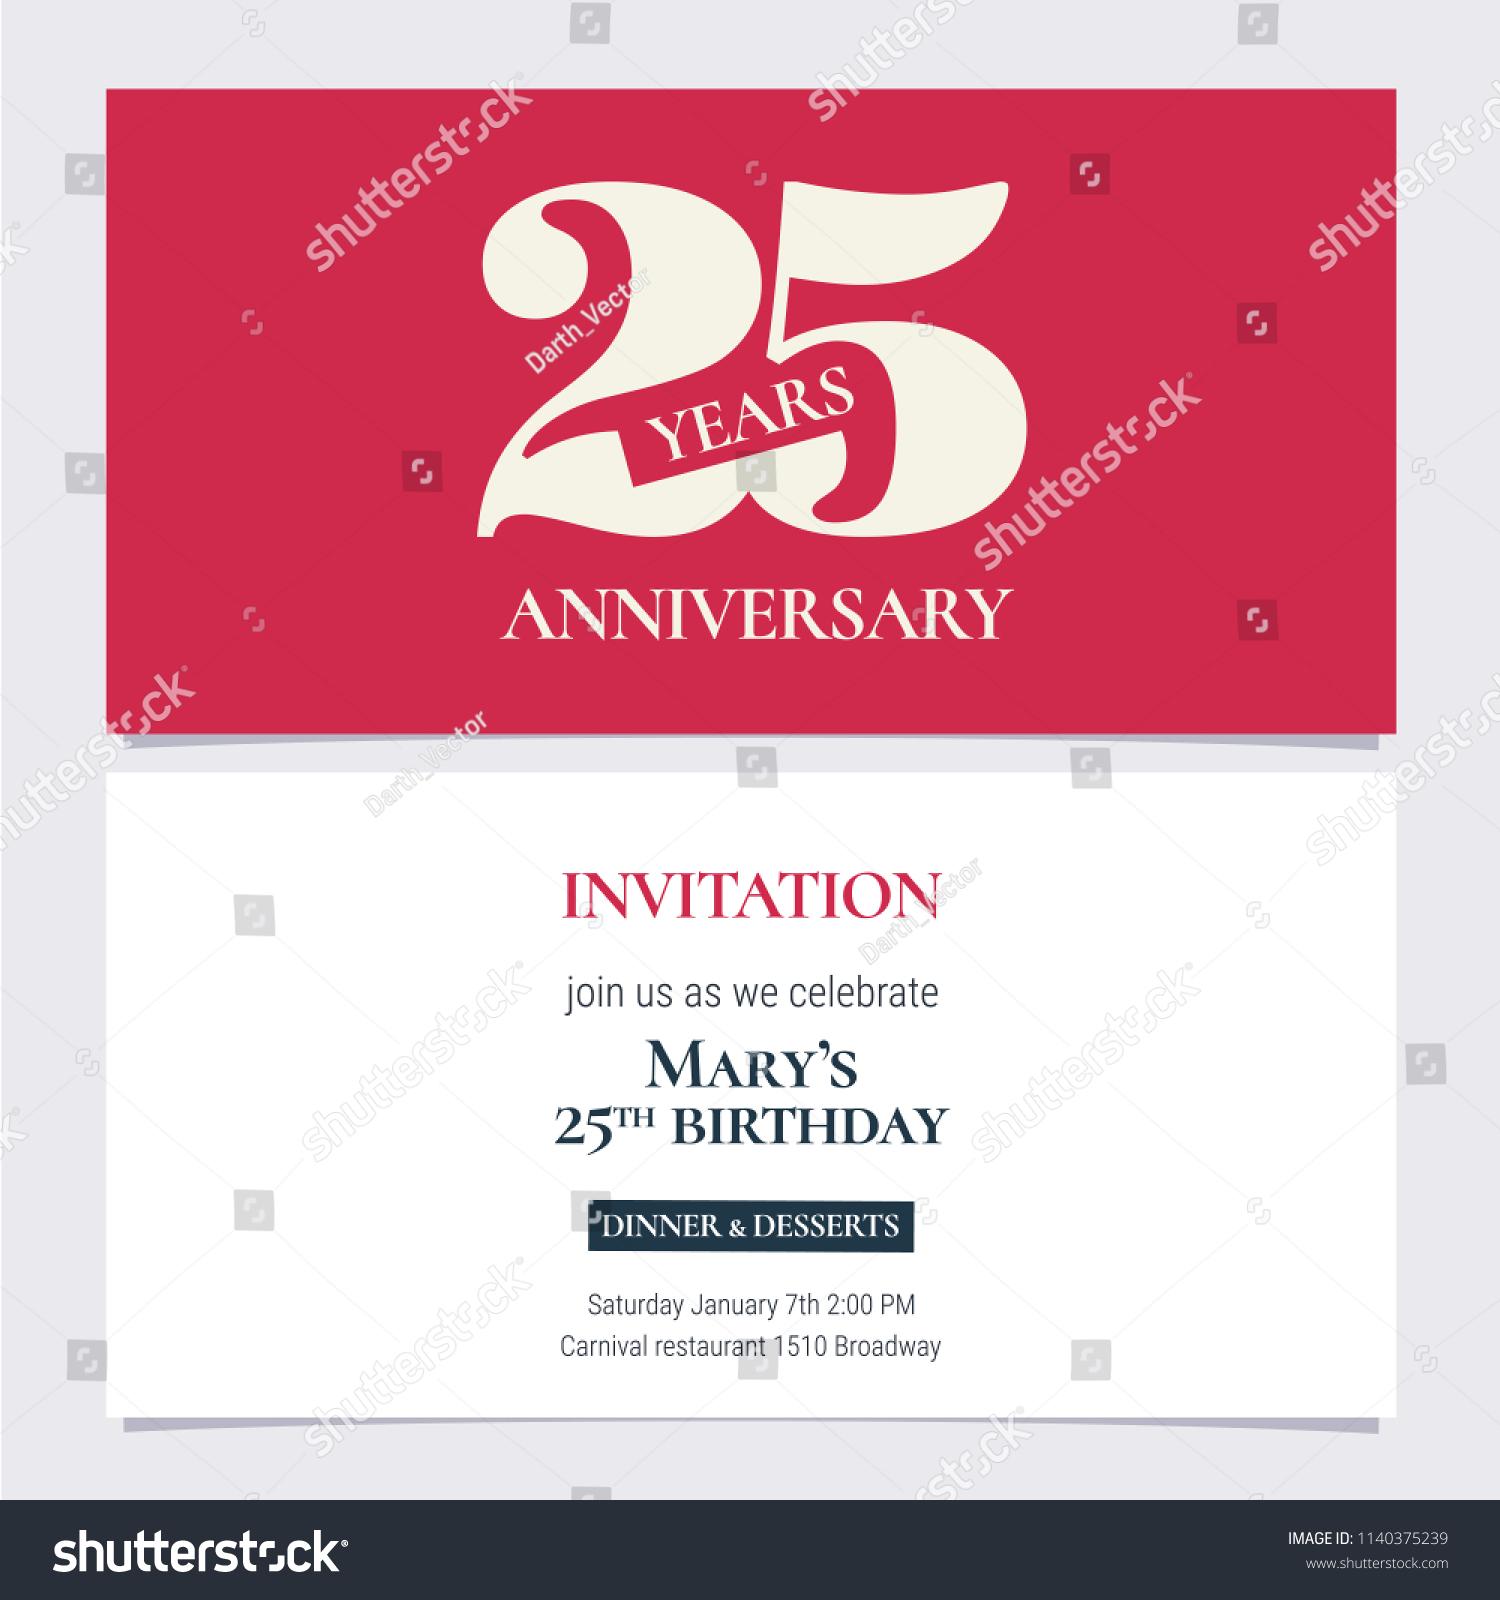 25 Years Anniversary Invitation Vector Illustration Stock Vector ...